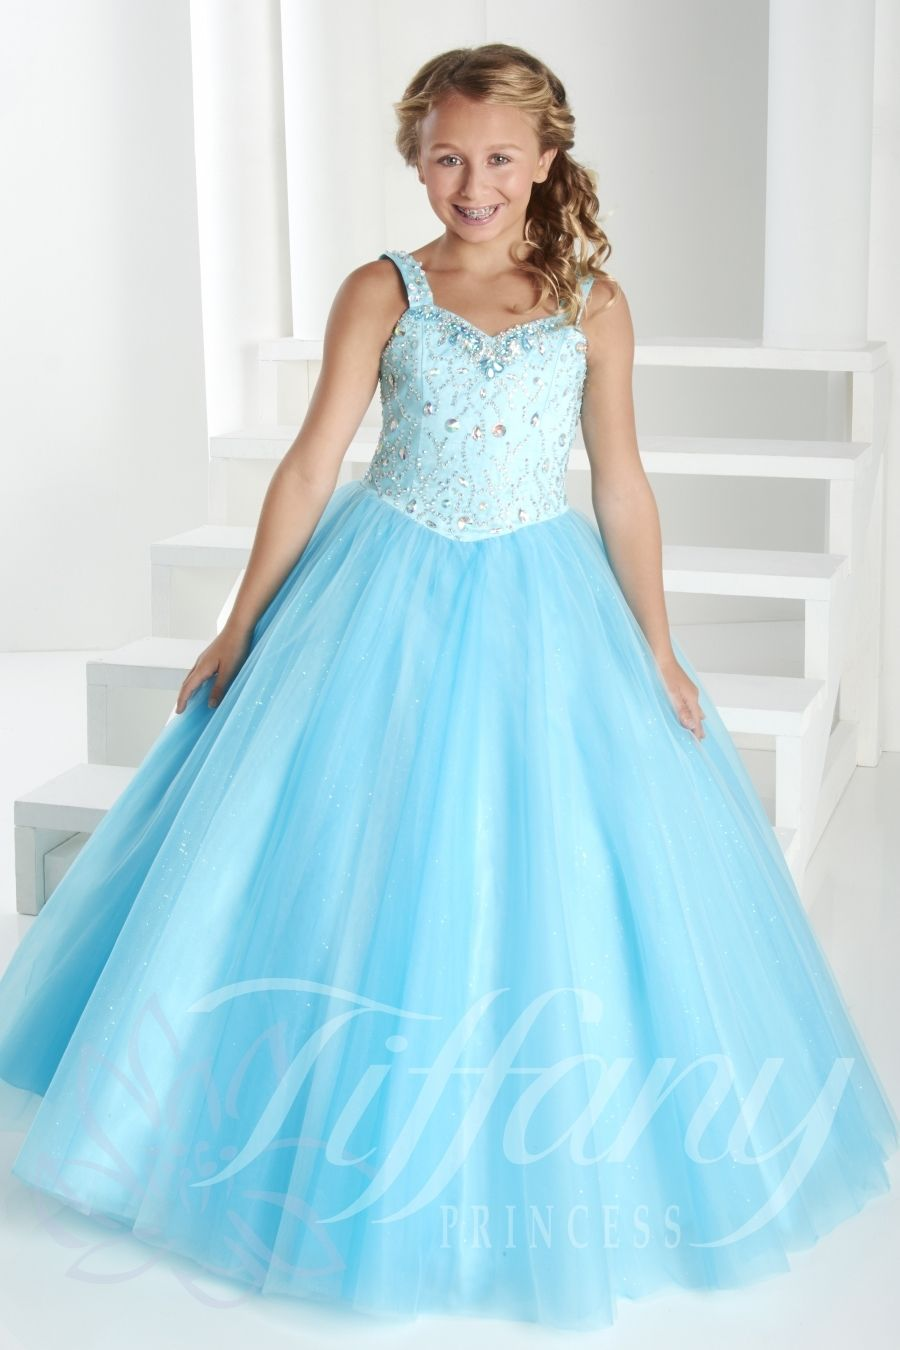 Tiffany Princess Little Girls Dress 13409 - Everything4pageants.com ...